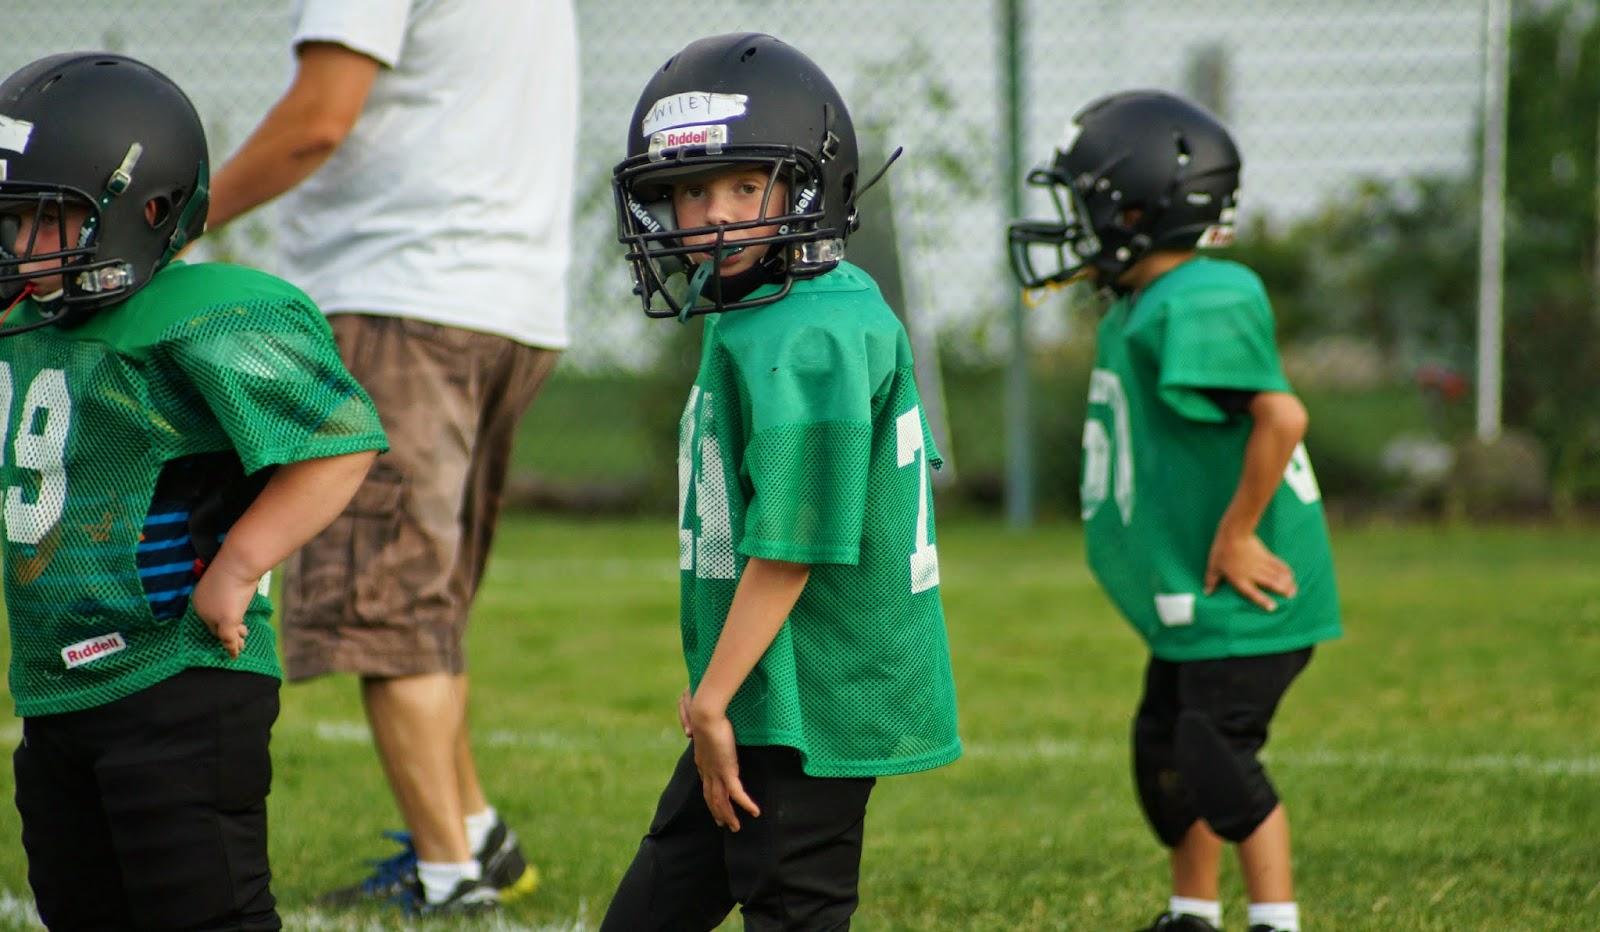 My little football guy